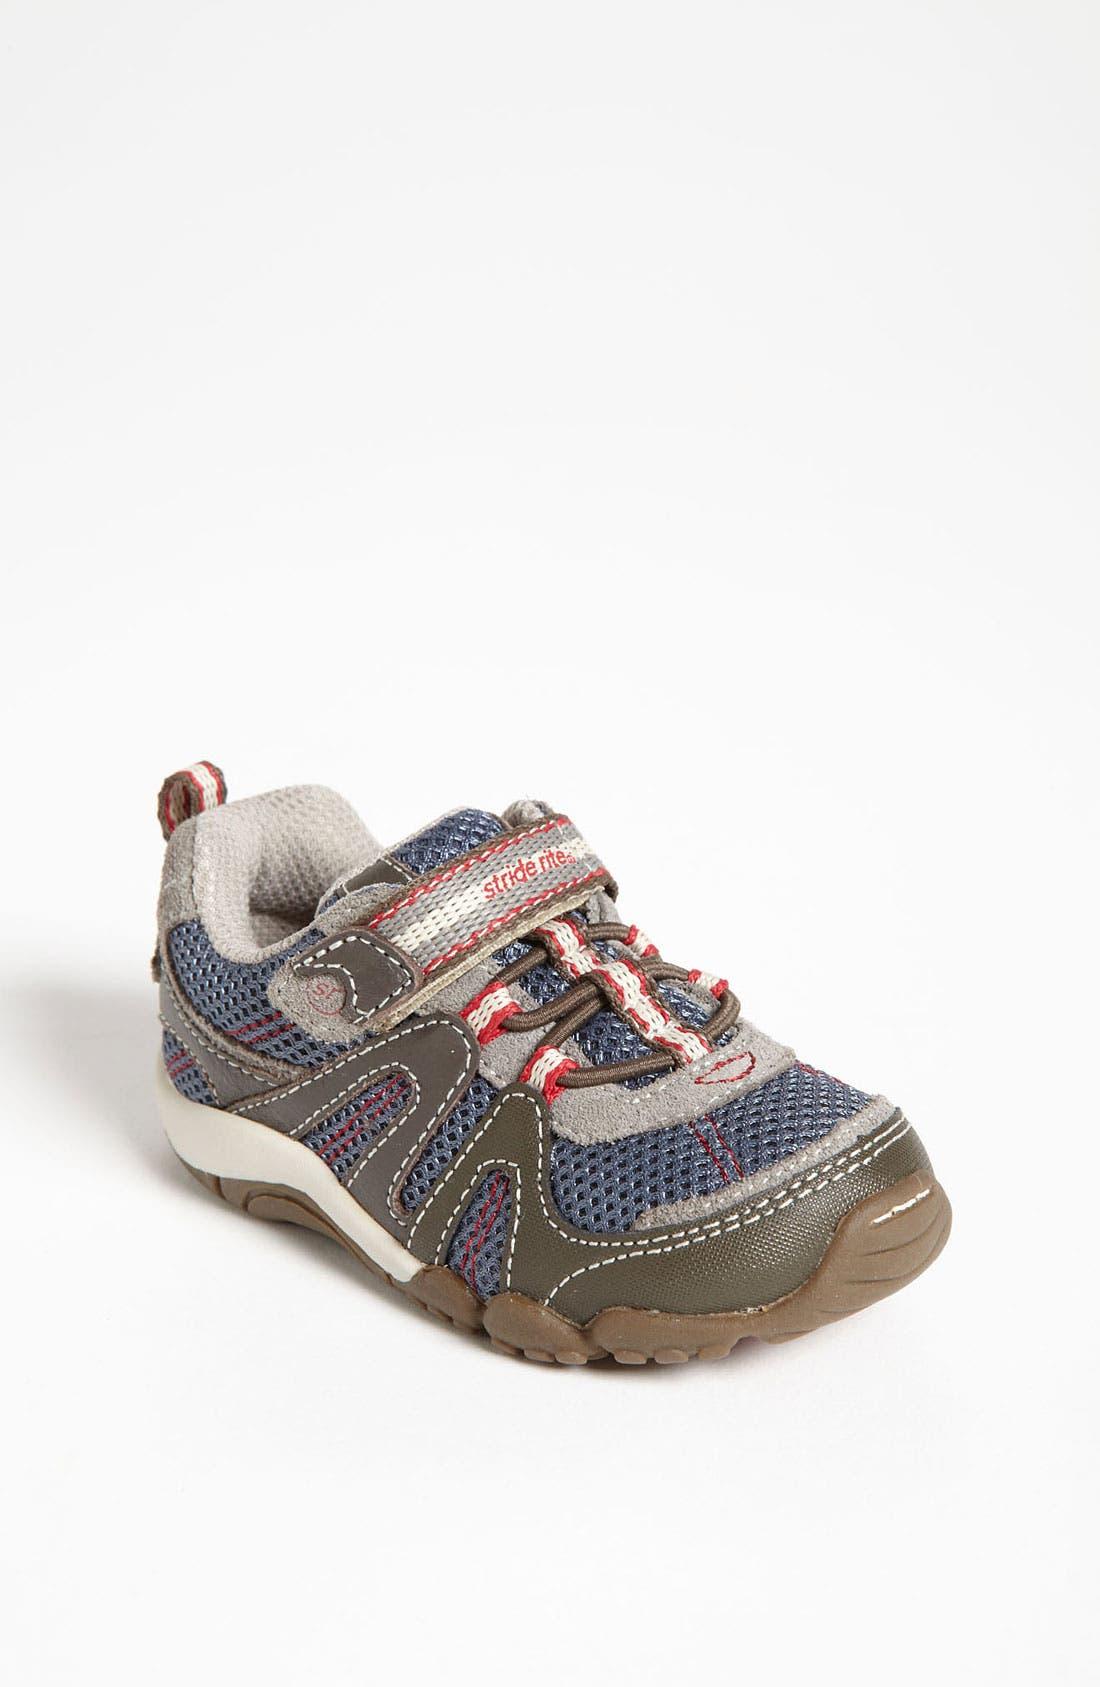 Main Image - Stride Rite 'Palmer' Sneaker (Baby, Walker & Toddler)